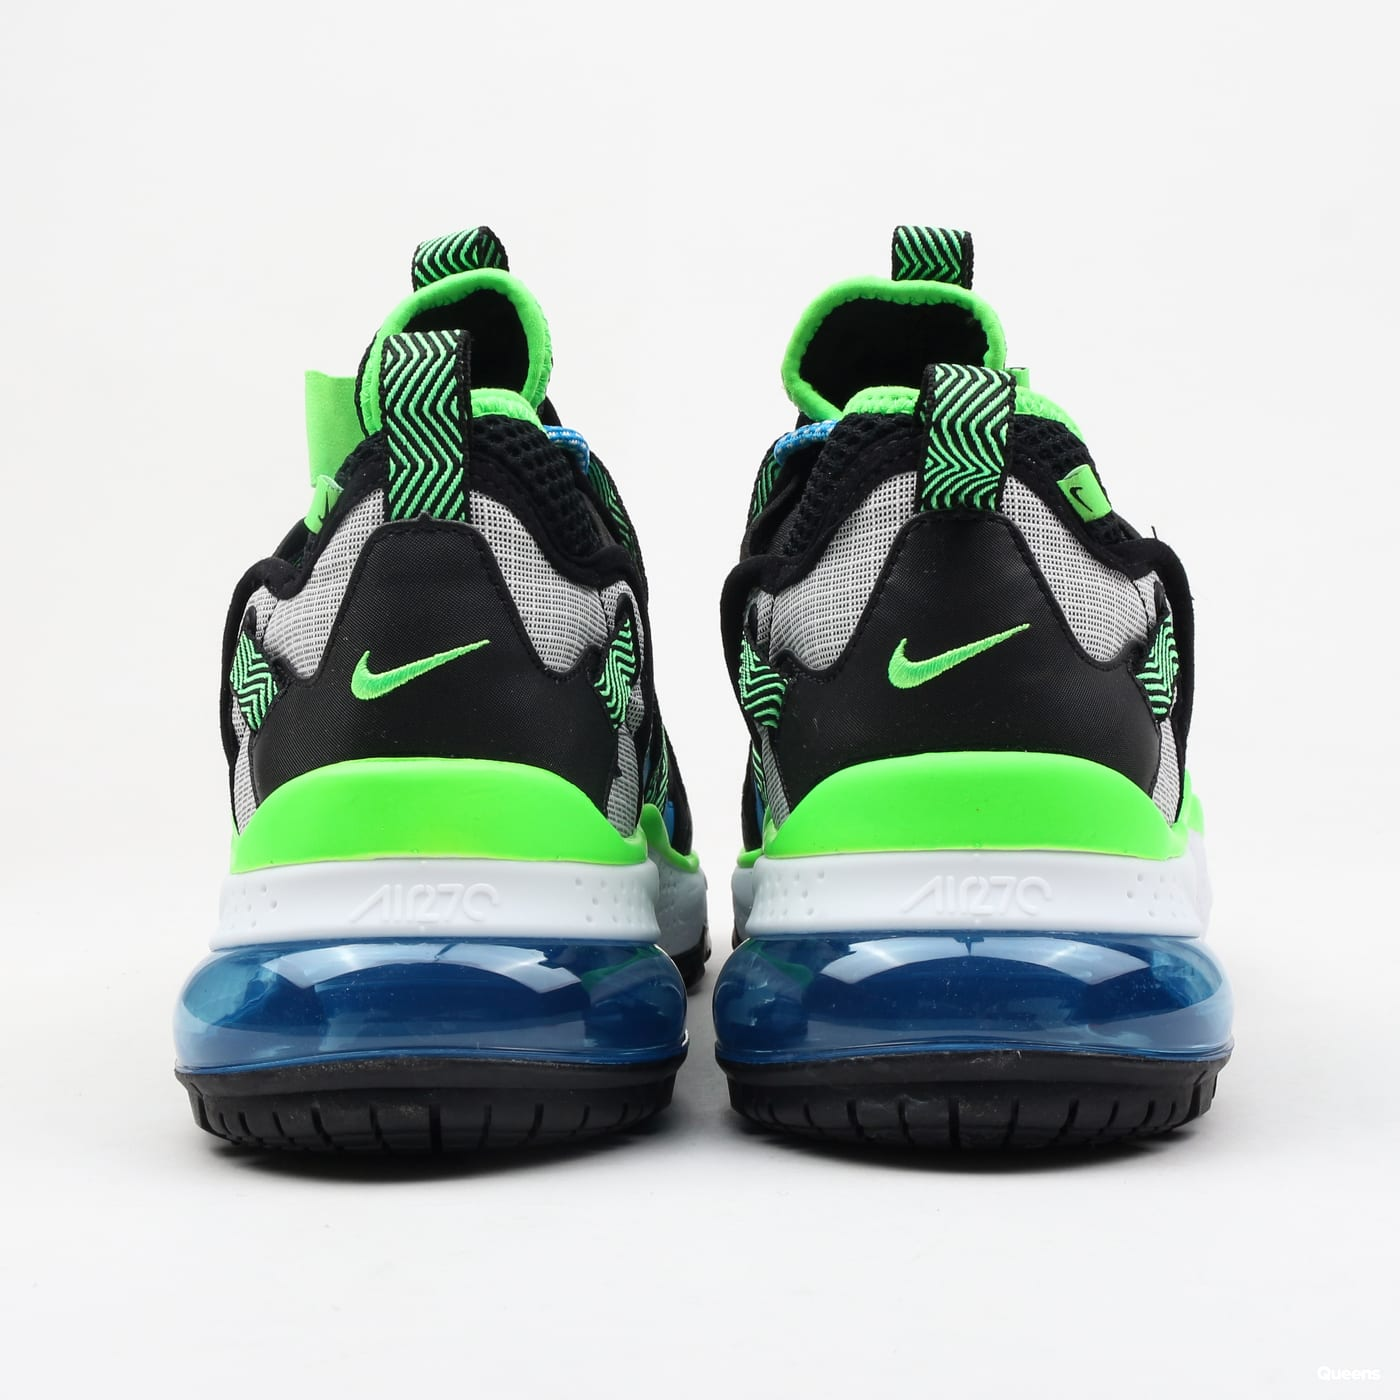 Nike Air Max 270 Bowfin black / black - phantom - photo blue